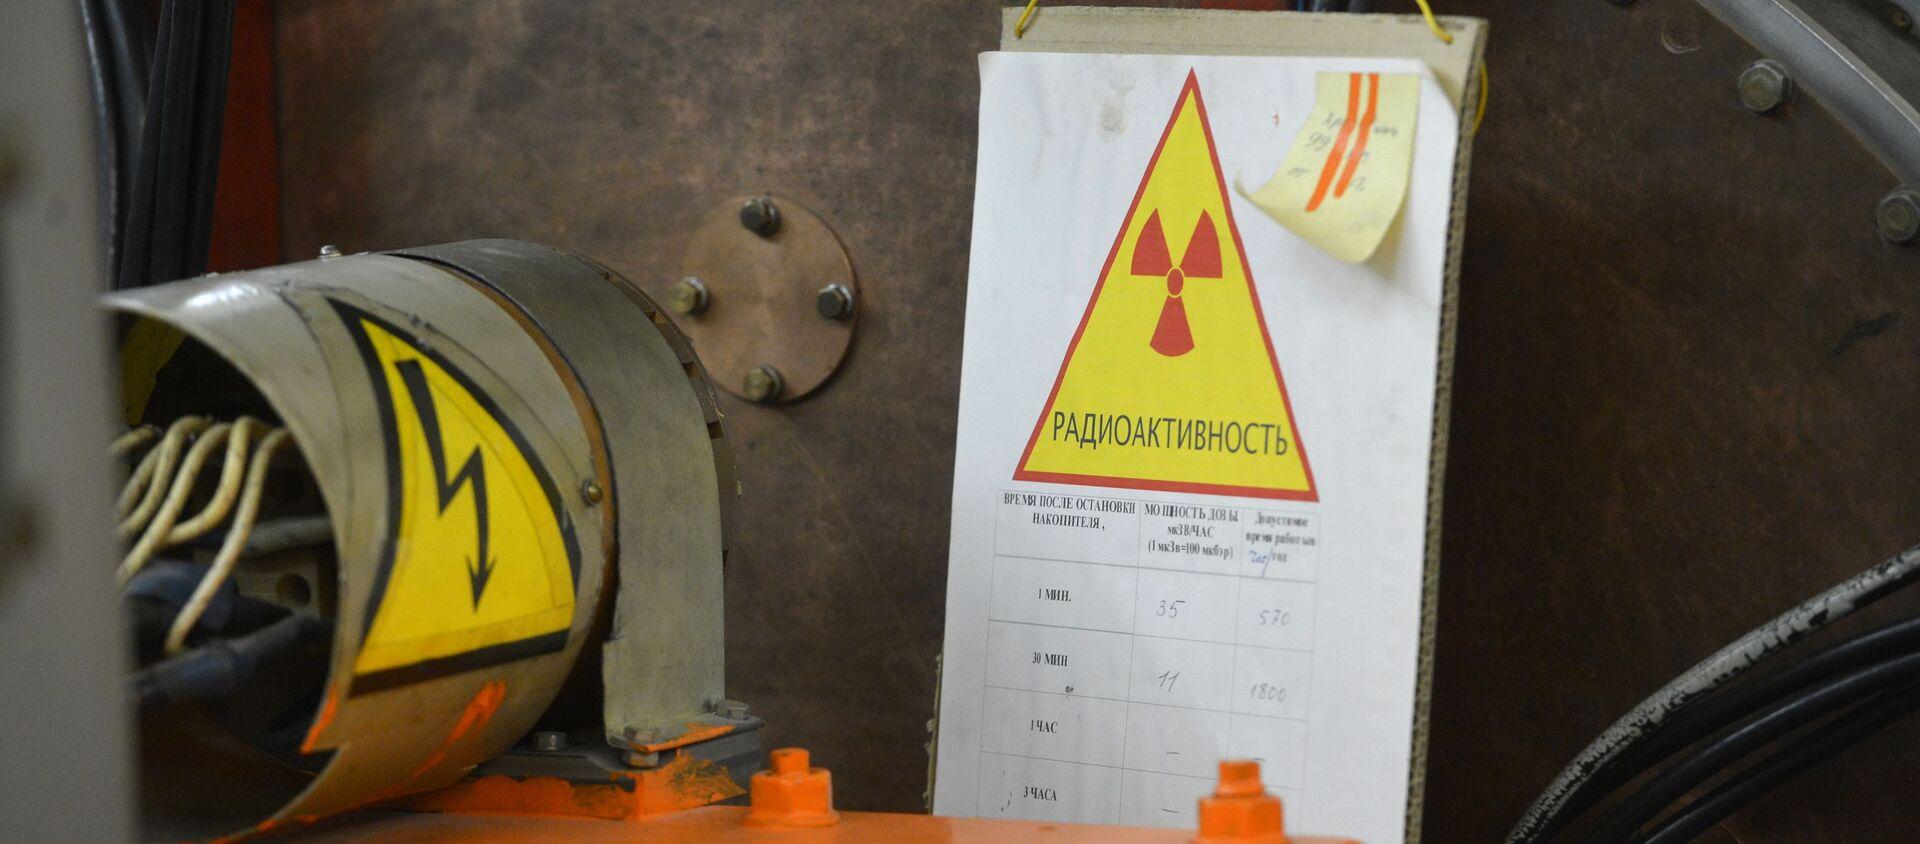 Знак Радиация - Sputnik Узбекистан, 1920, 27.11.2020